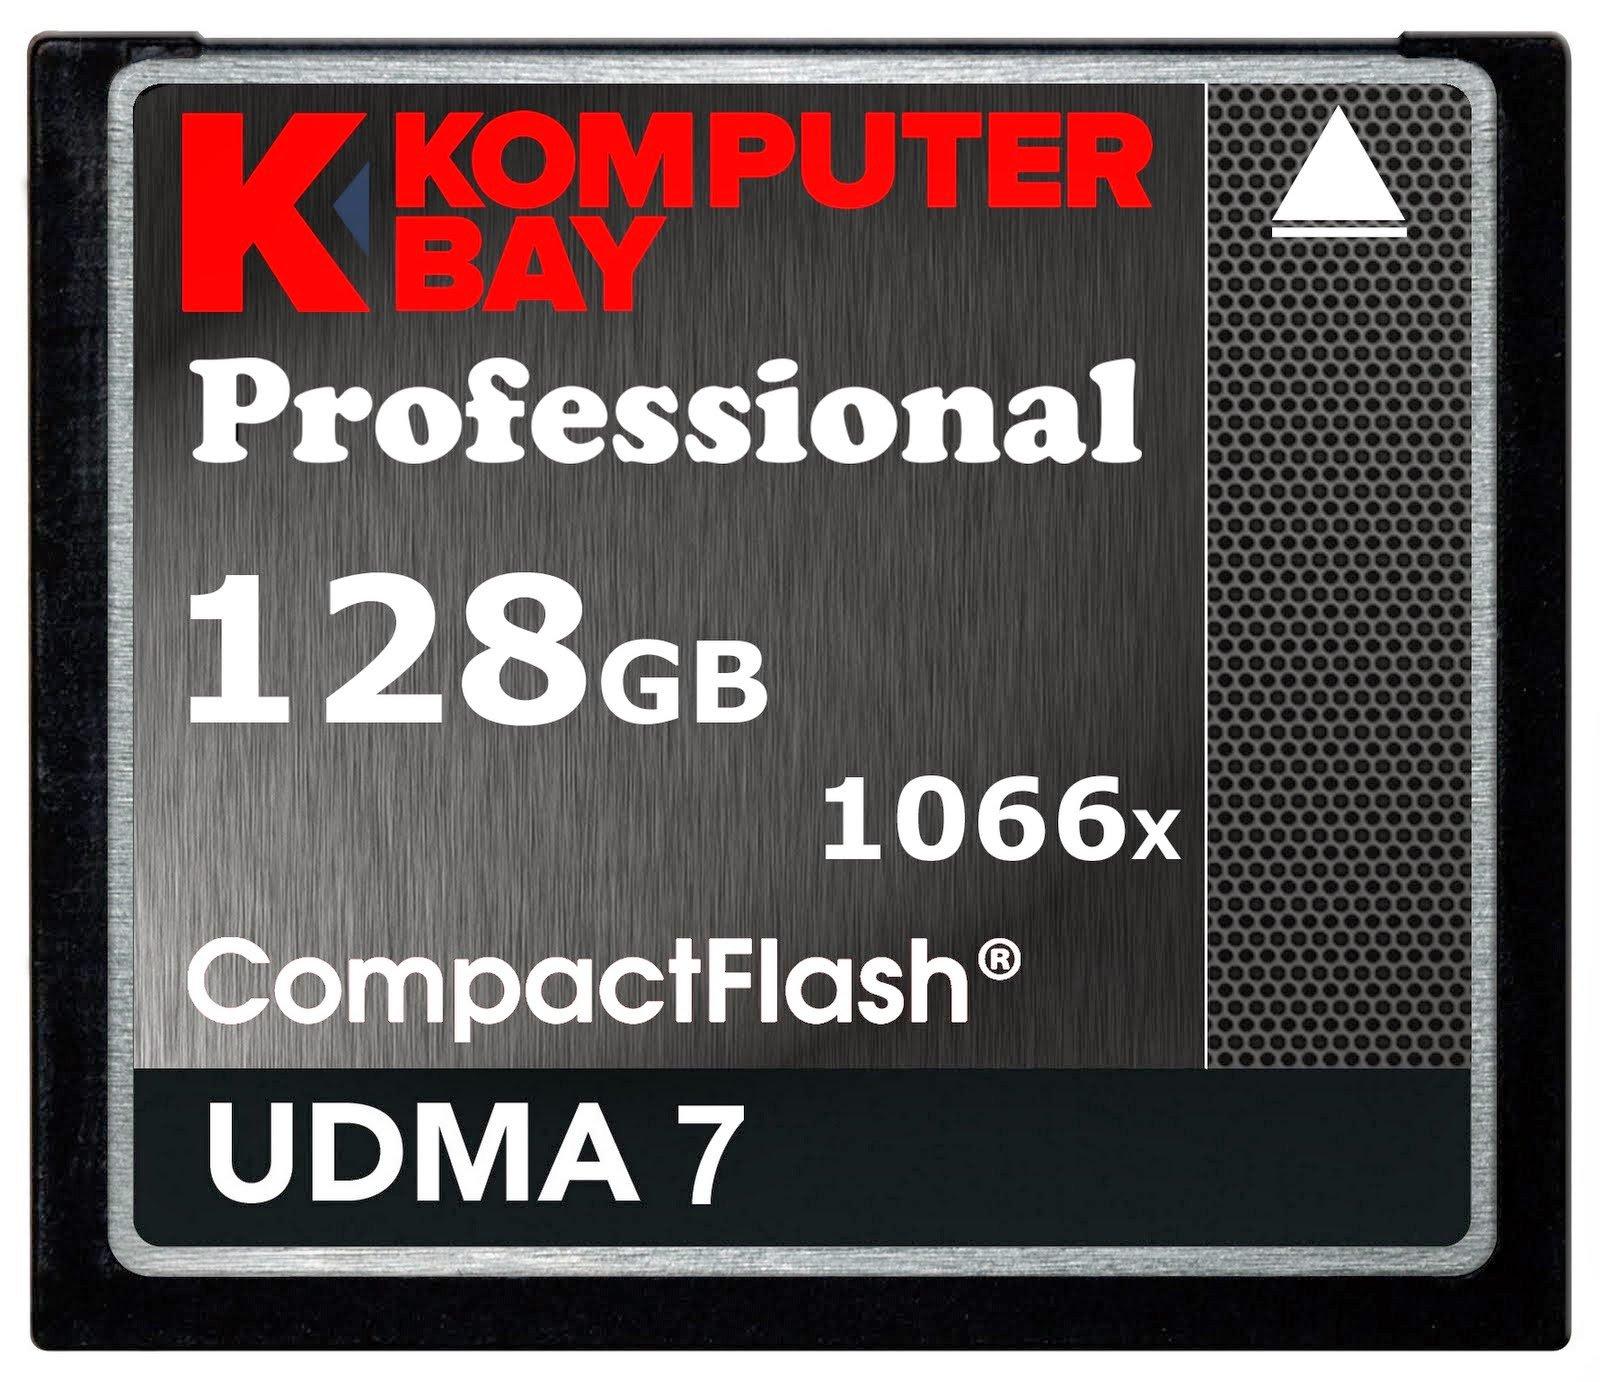 Komputerbay 128GB Professional Compact Flash card 1066X CF Write 155MB/s Read 160MB/s Extreme Speed UDMA 7 RAW by KOMPUTERBAY